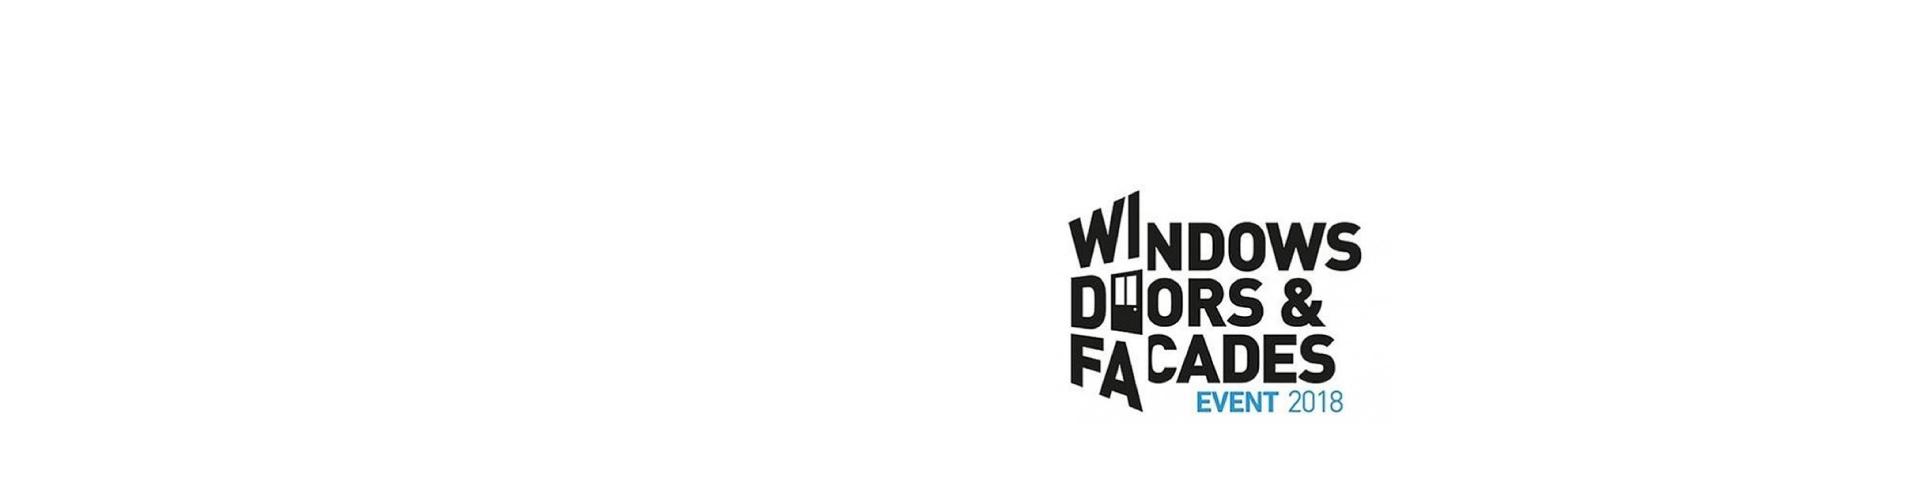 windows-doors-and-facades-event-2018